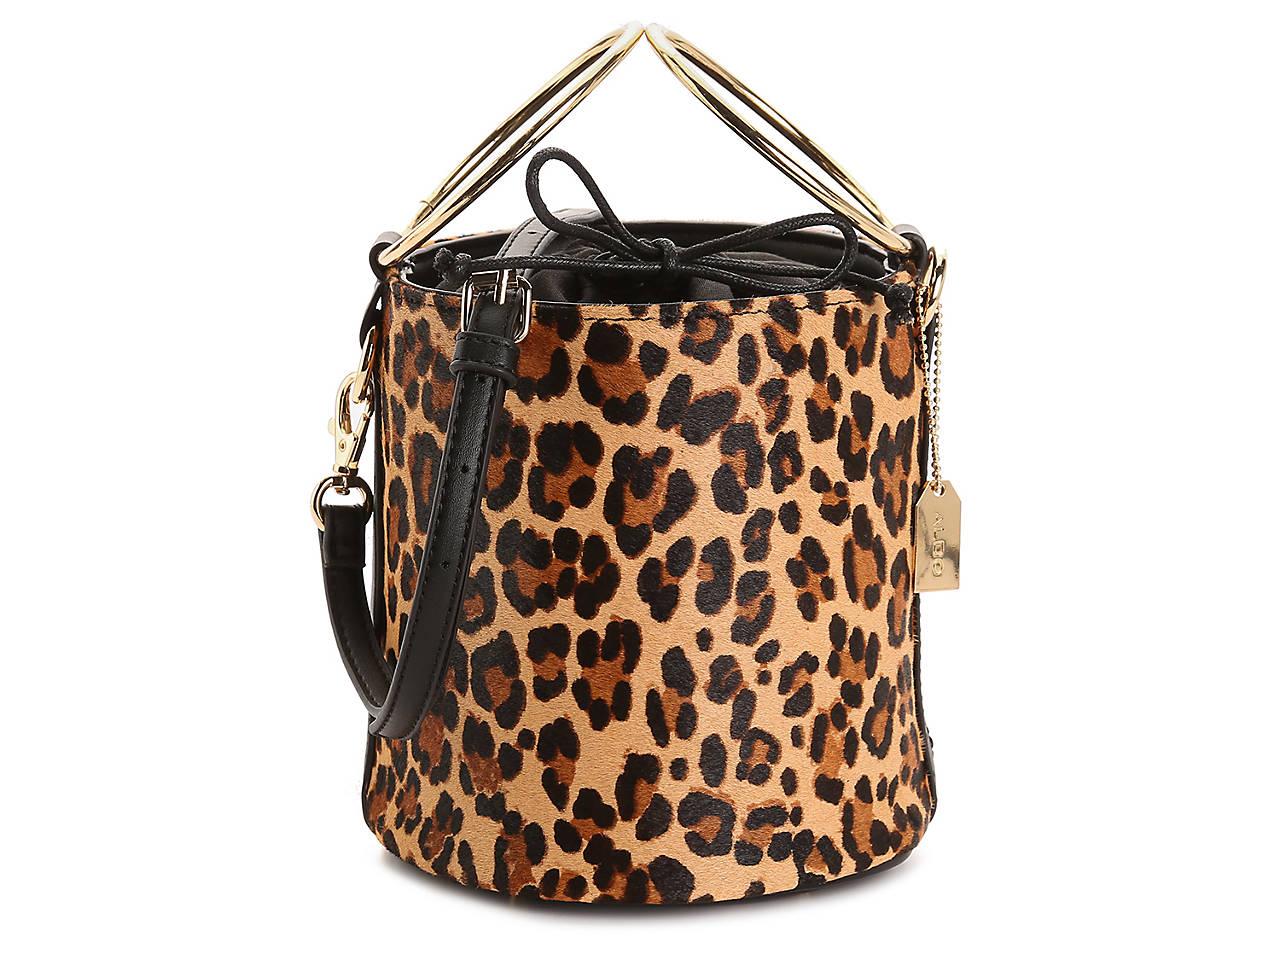 69736cc52a Aldo Cadiawien Bucket Bag Women's Handbags & Accessories | DSW